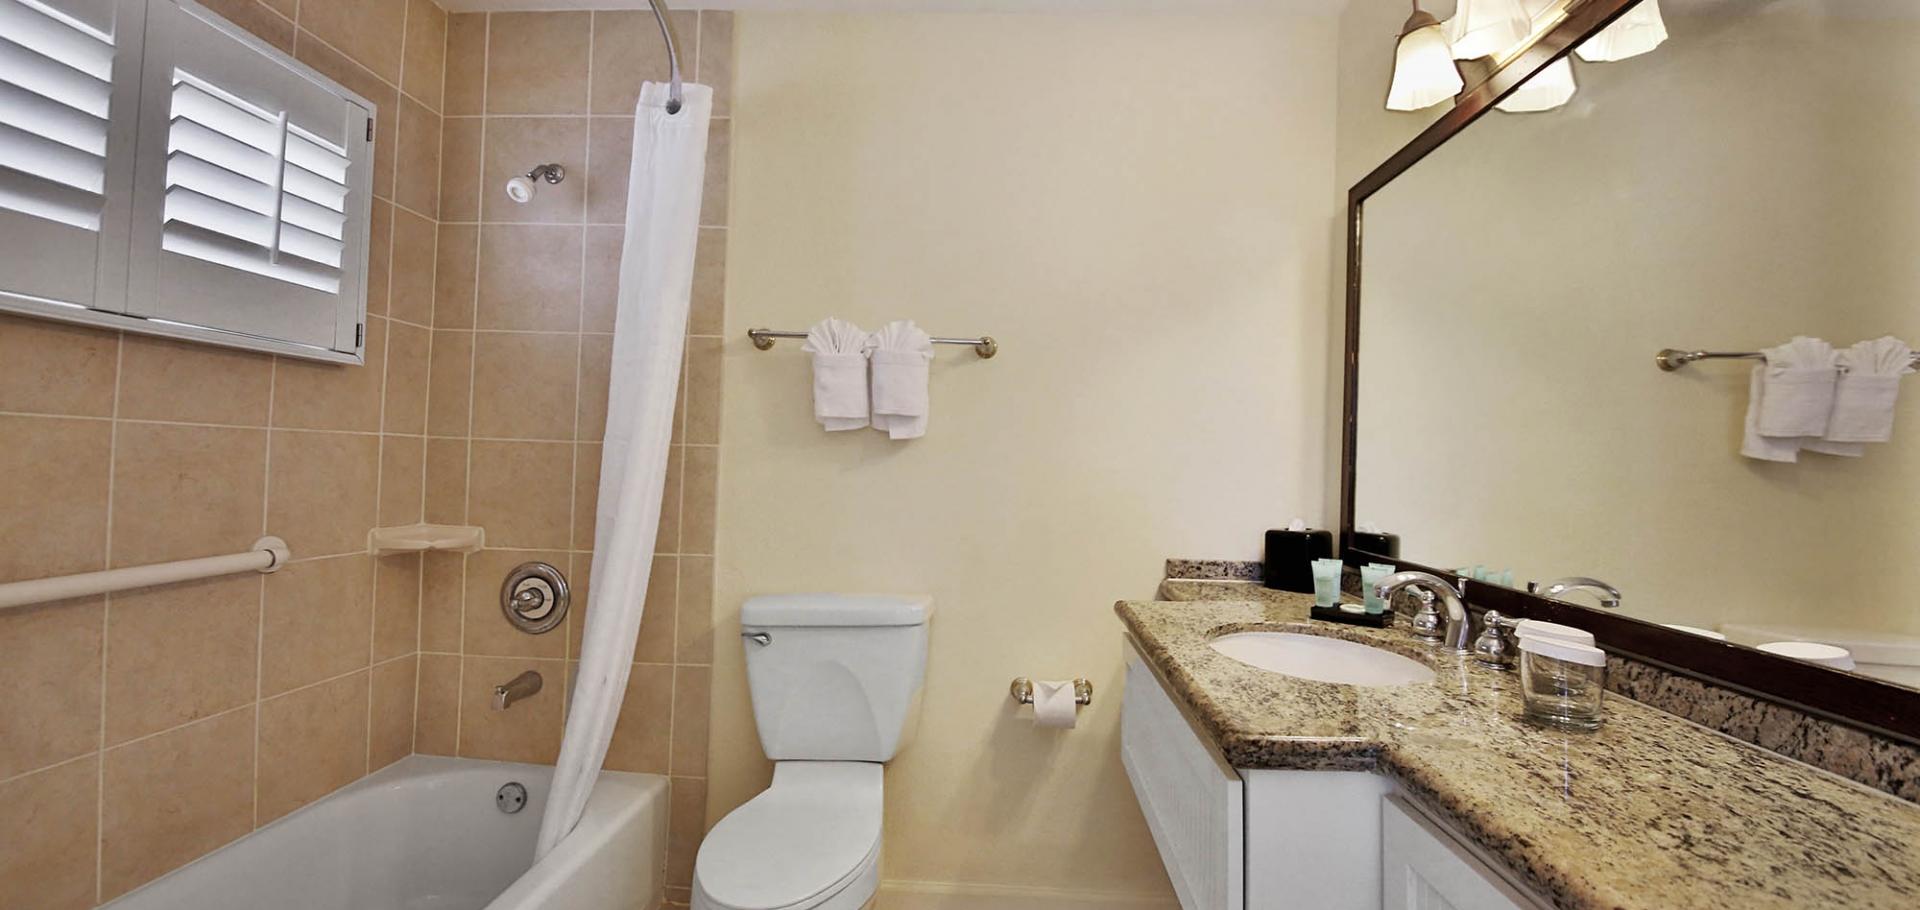 Sanibel Seaside Inn bathroom, bath, shower, and amenities